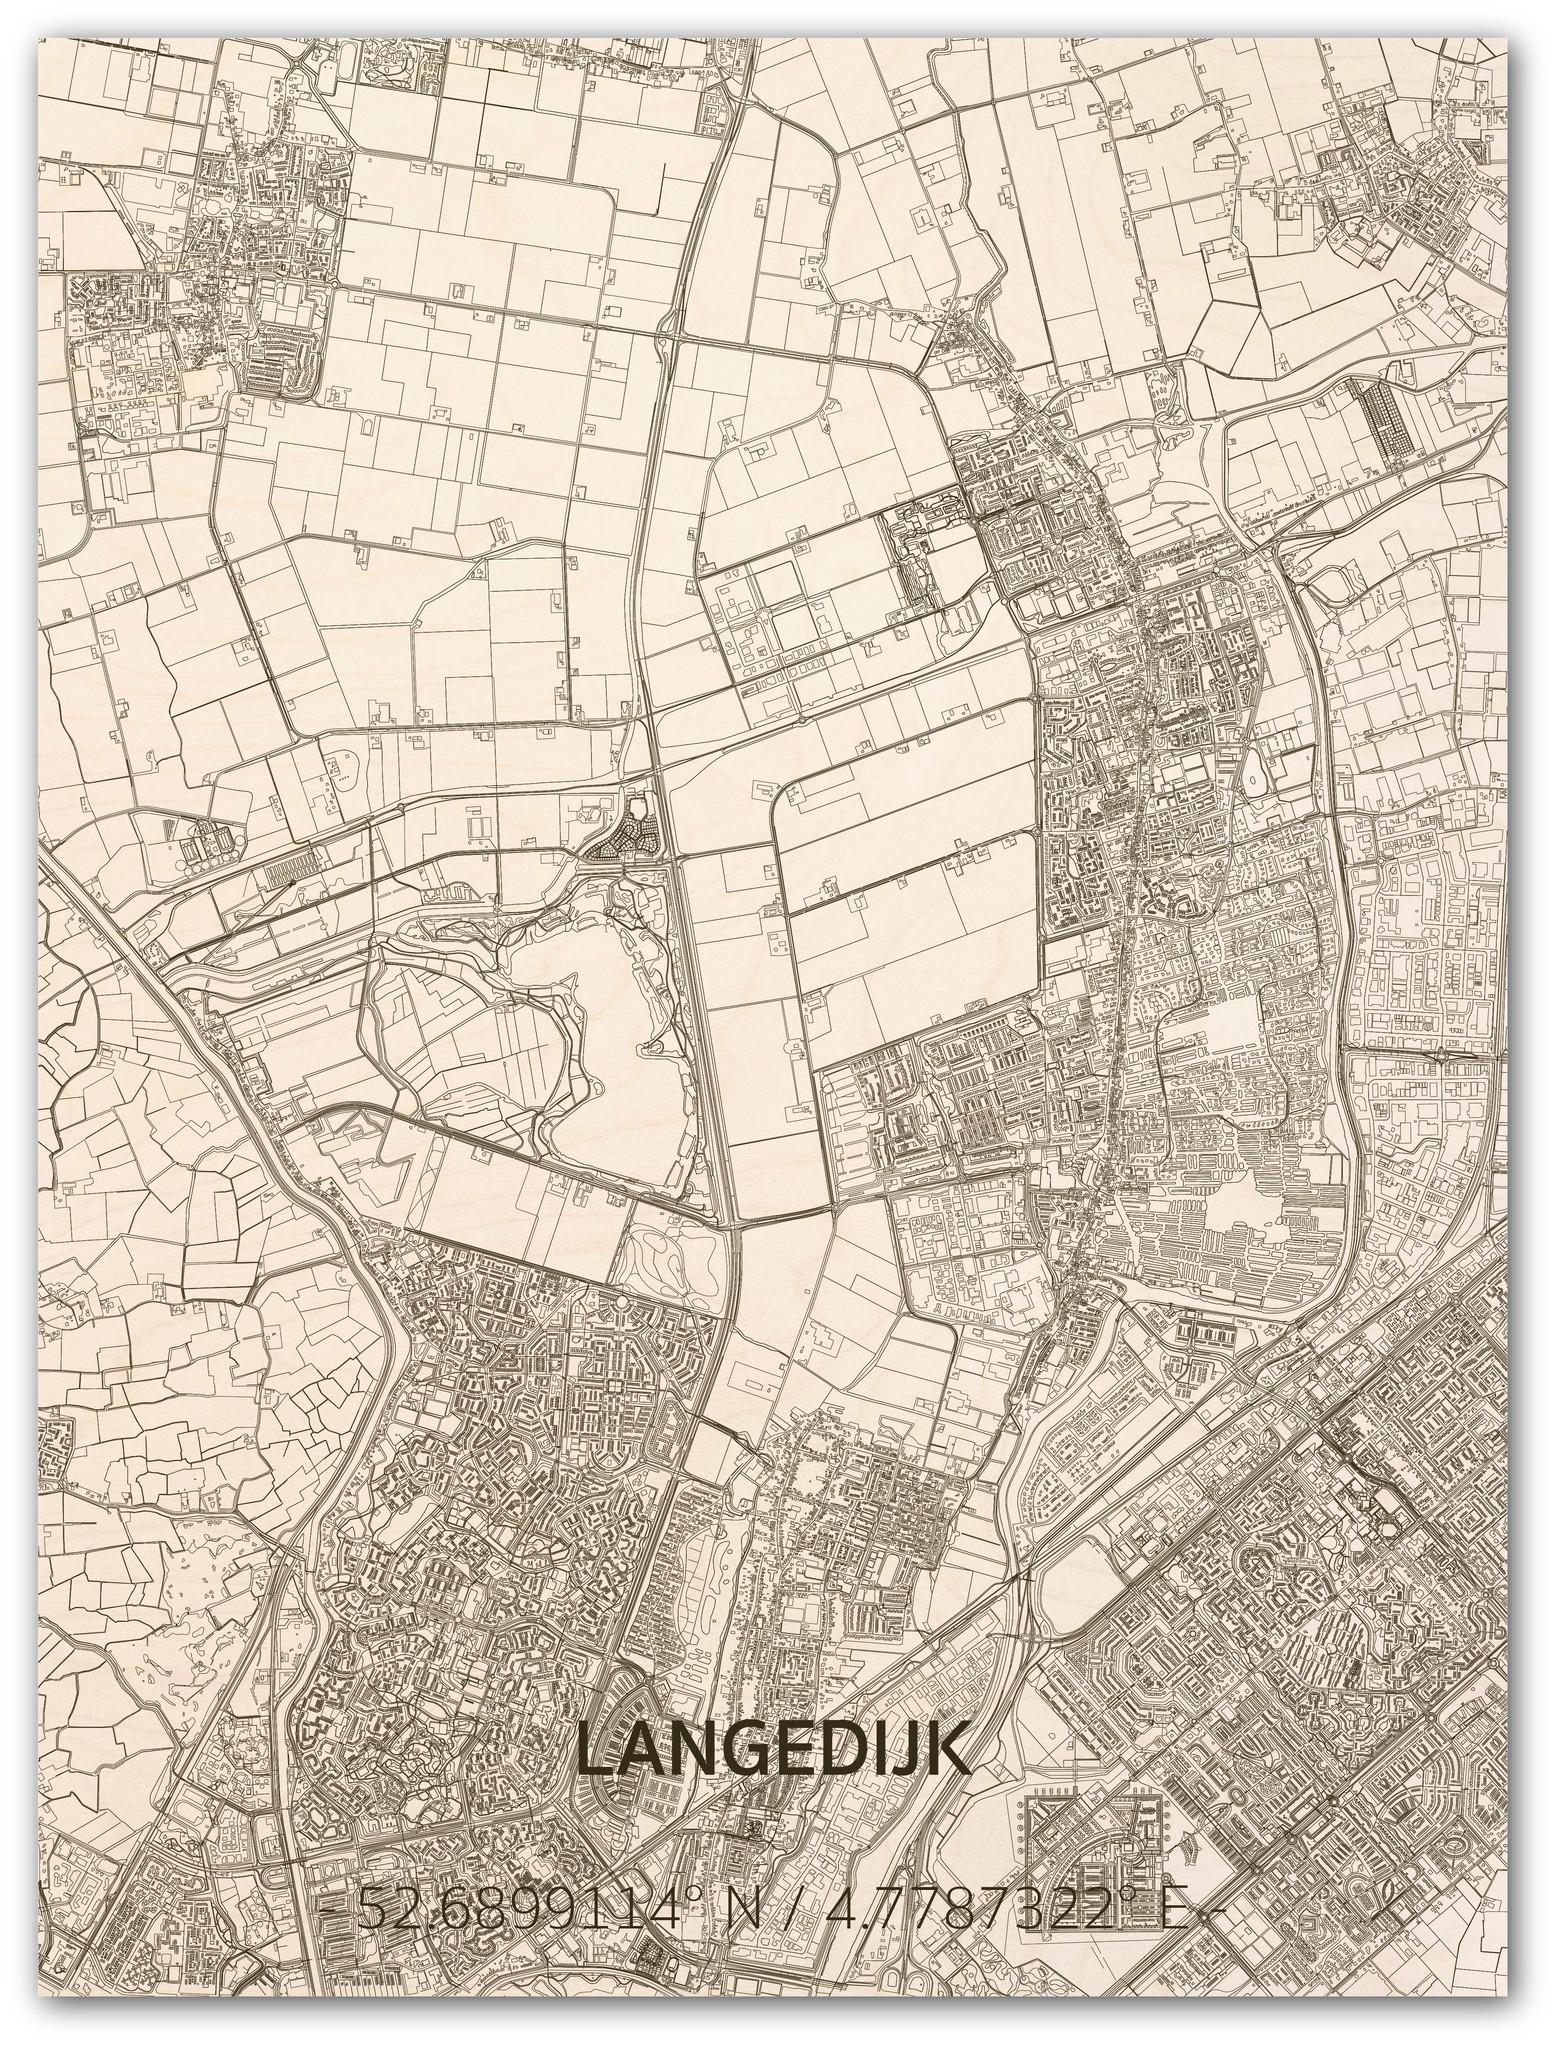 Stadtplan Langedijk | Wanddekoration Holz-1